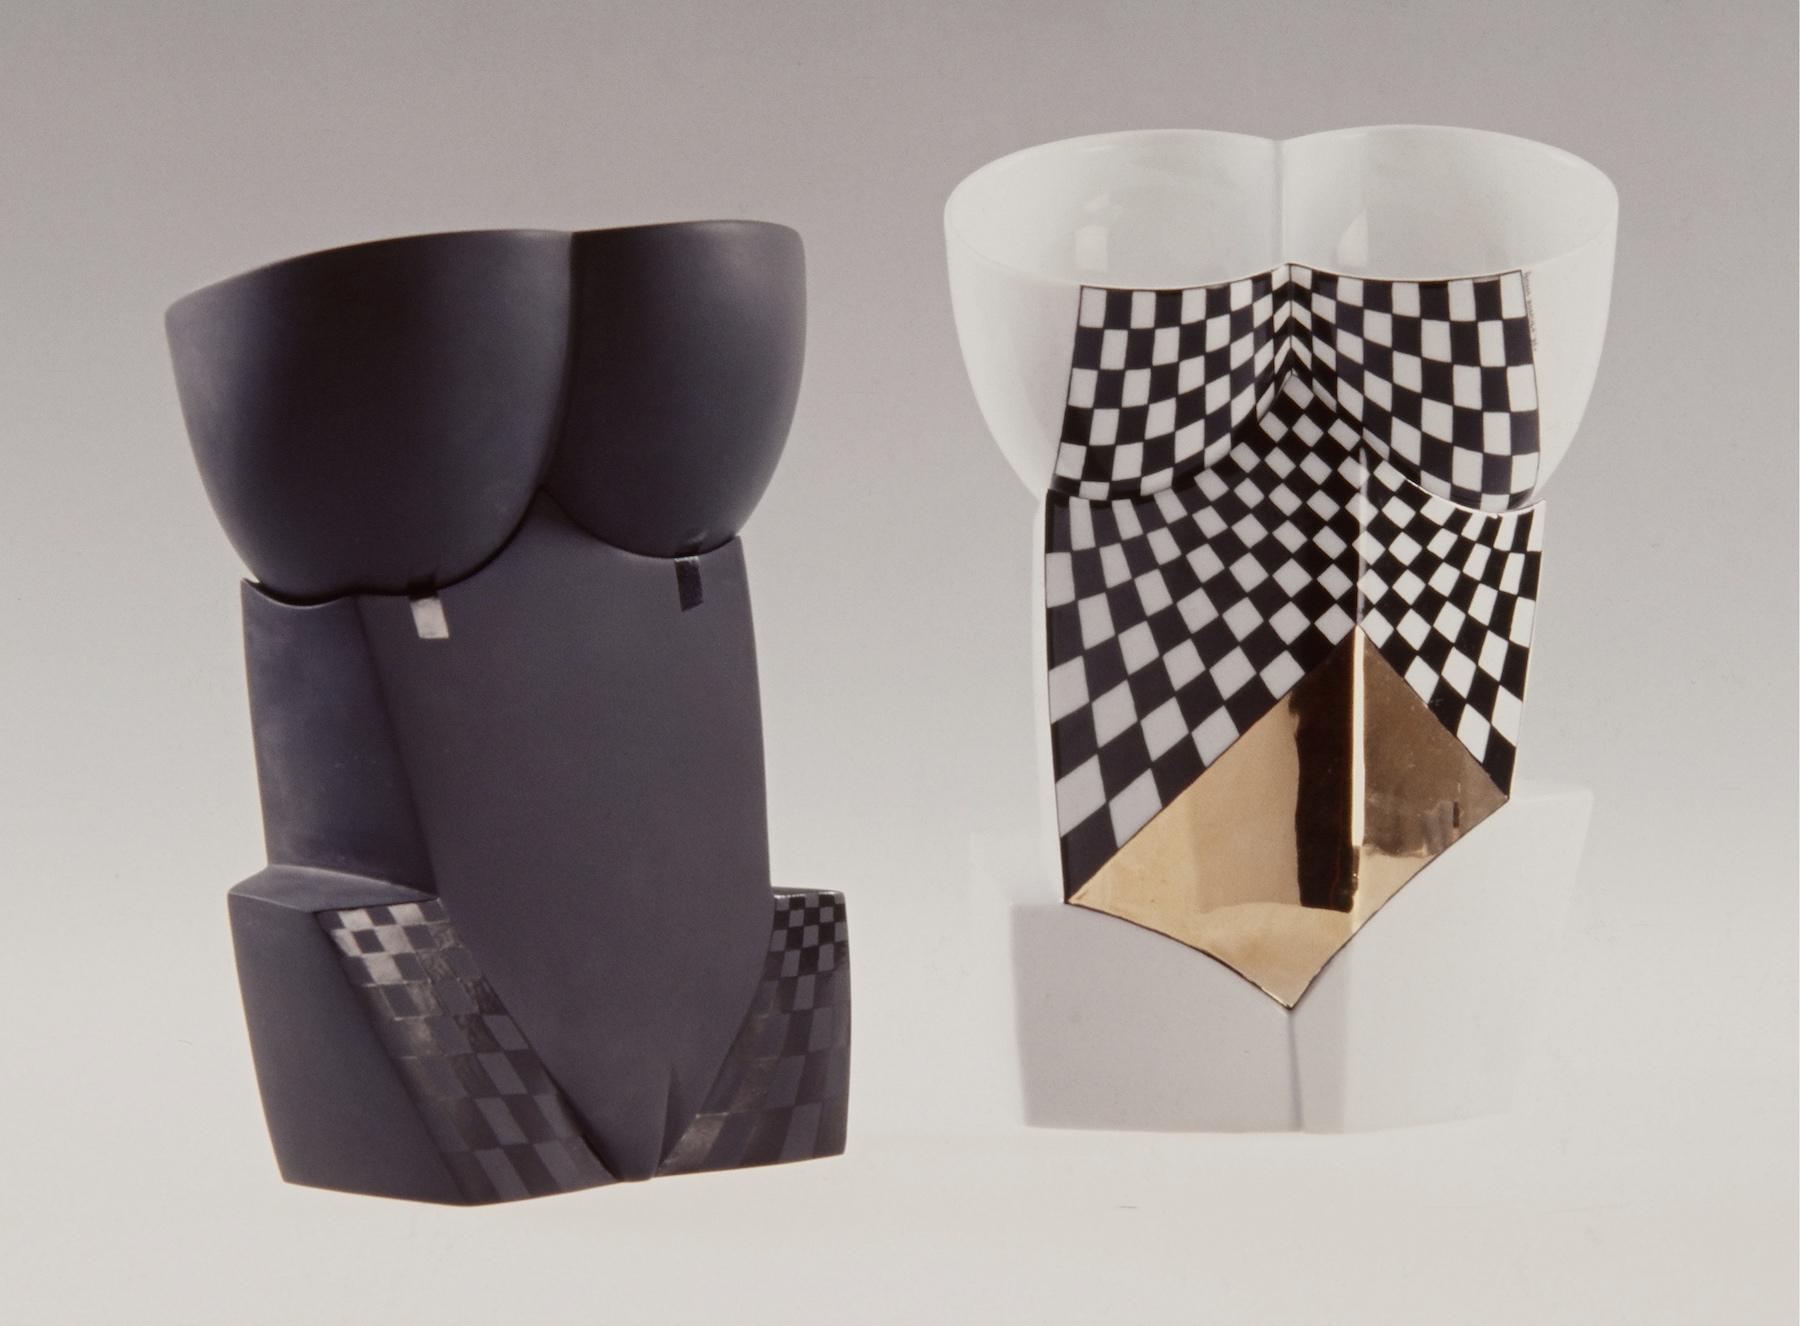 024. Female Bowl (1995)